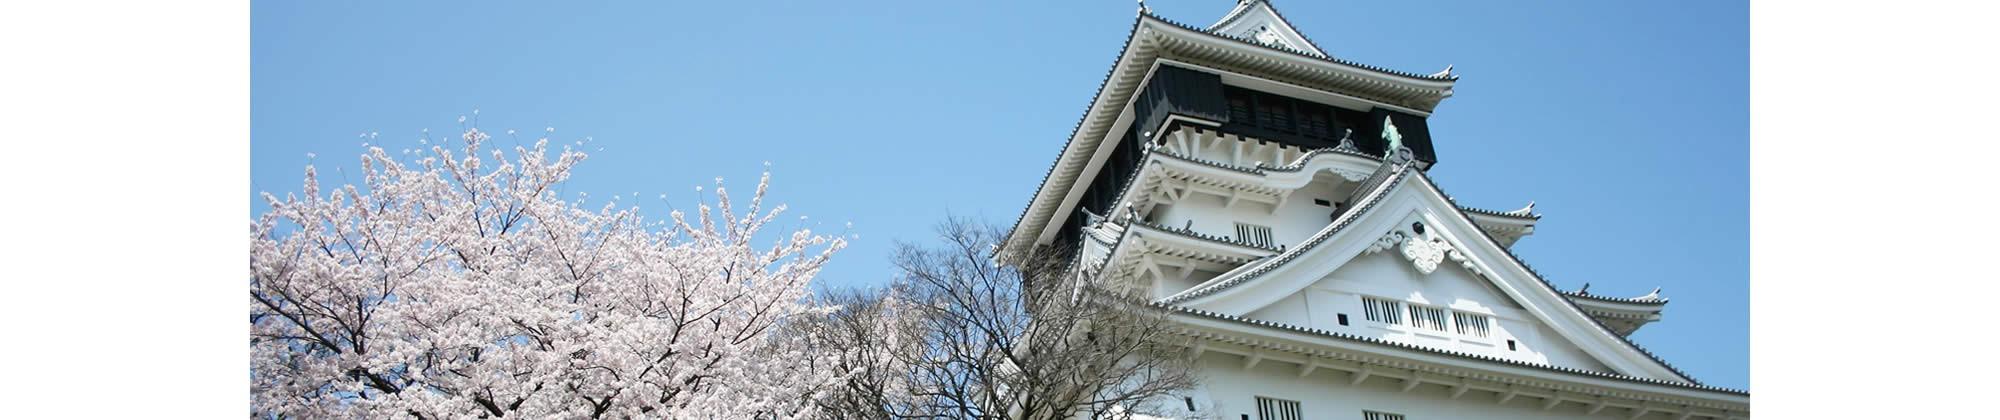 Kitakyushu Walks